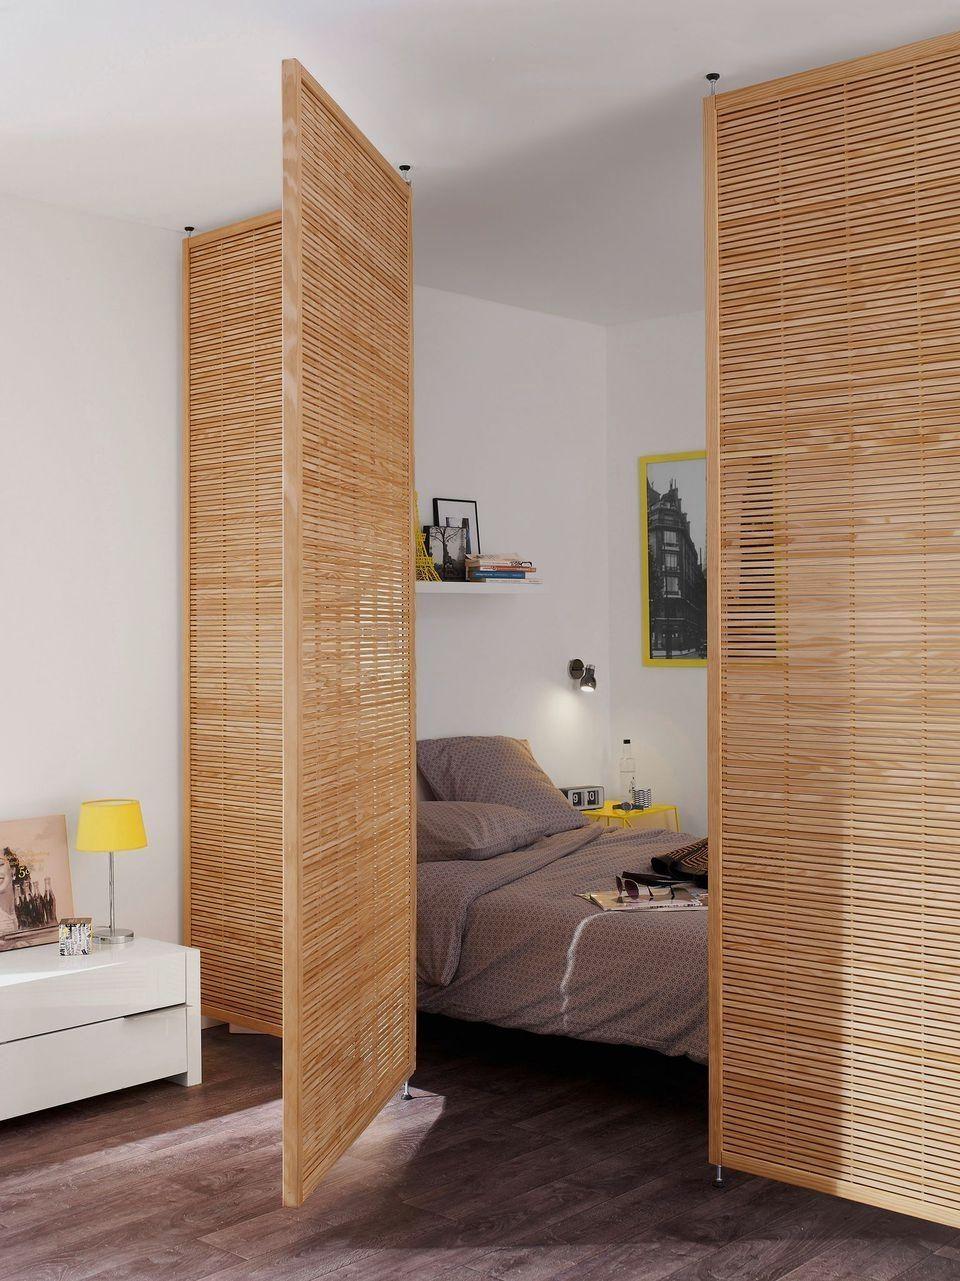 New Bamboo Decoration Ideas Diybambooideas Diy Bamboo In